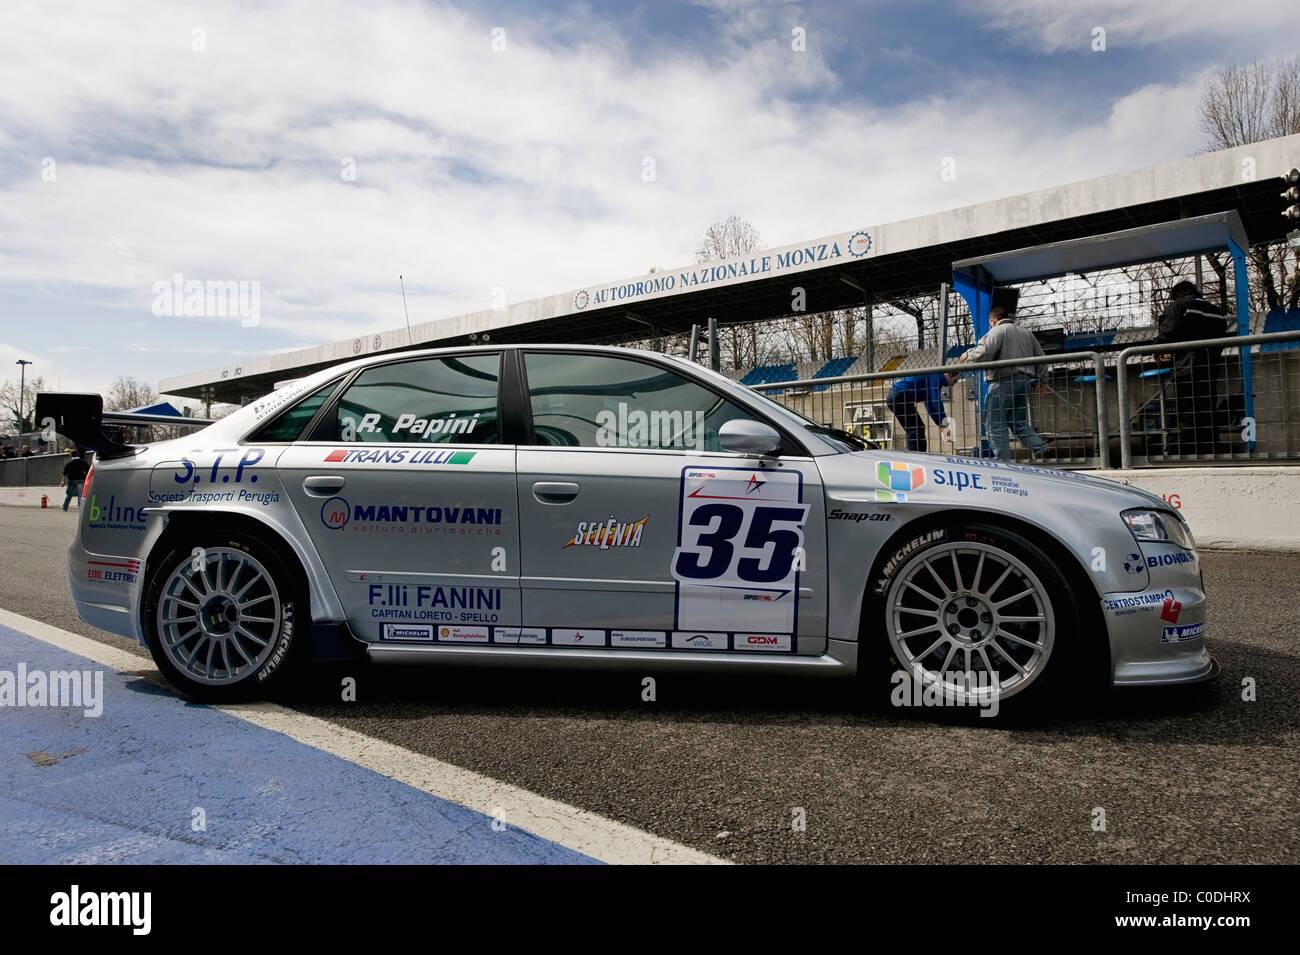 Circuit Monza Italia : Monza italy may ferrari stock photo royalty free